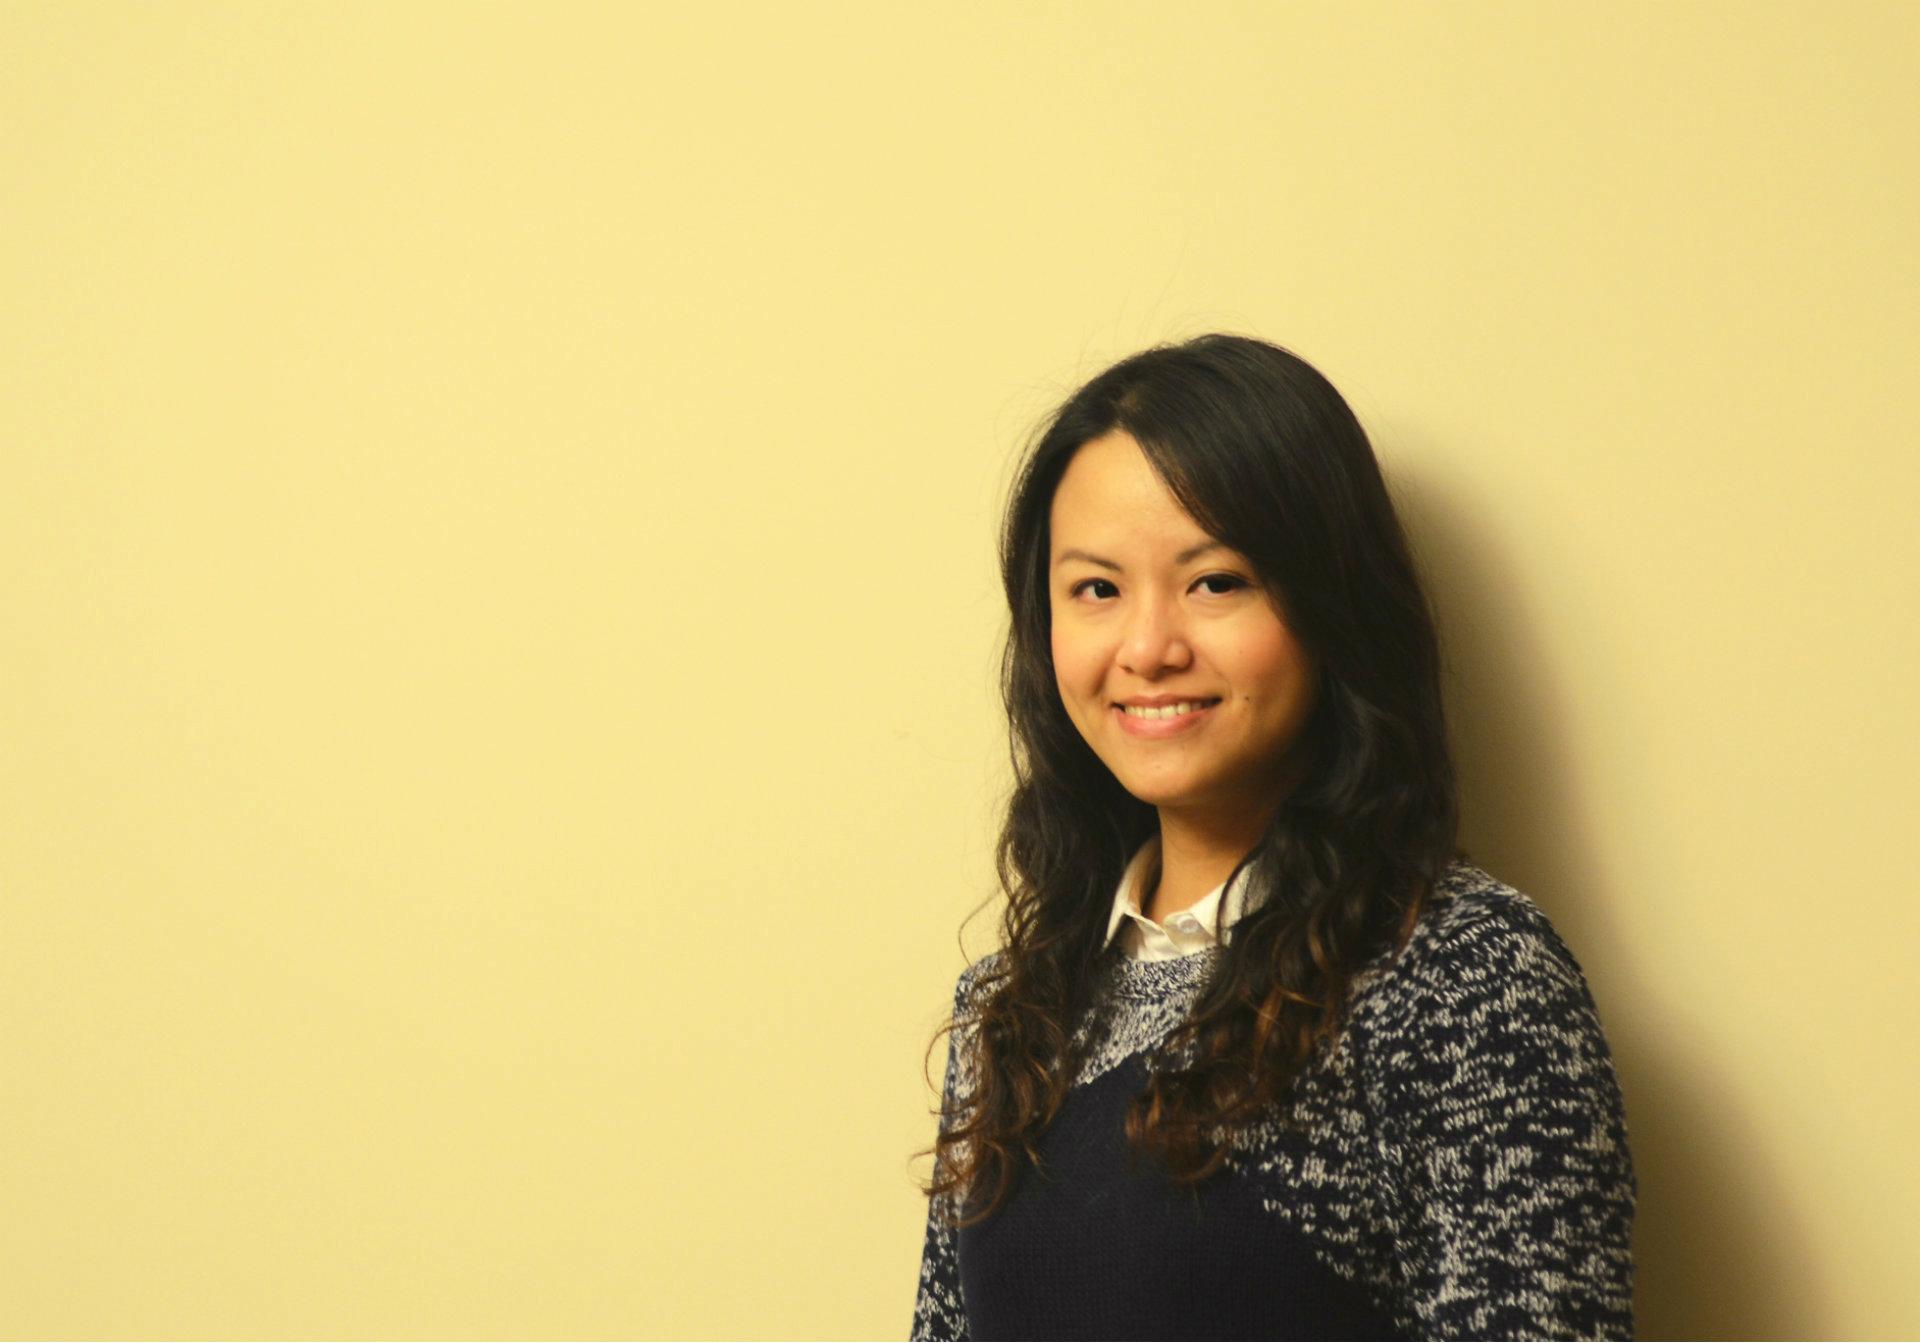 起飛的上海,關鍵的七年:Johnson & Johnson Consumer 財務經理 Denise